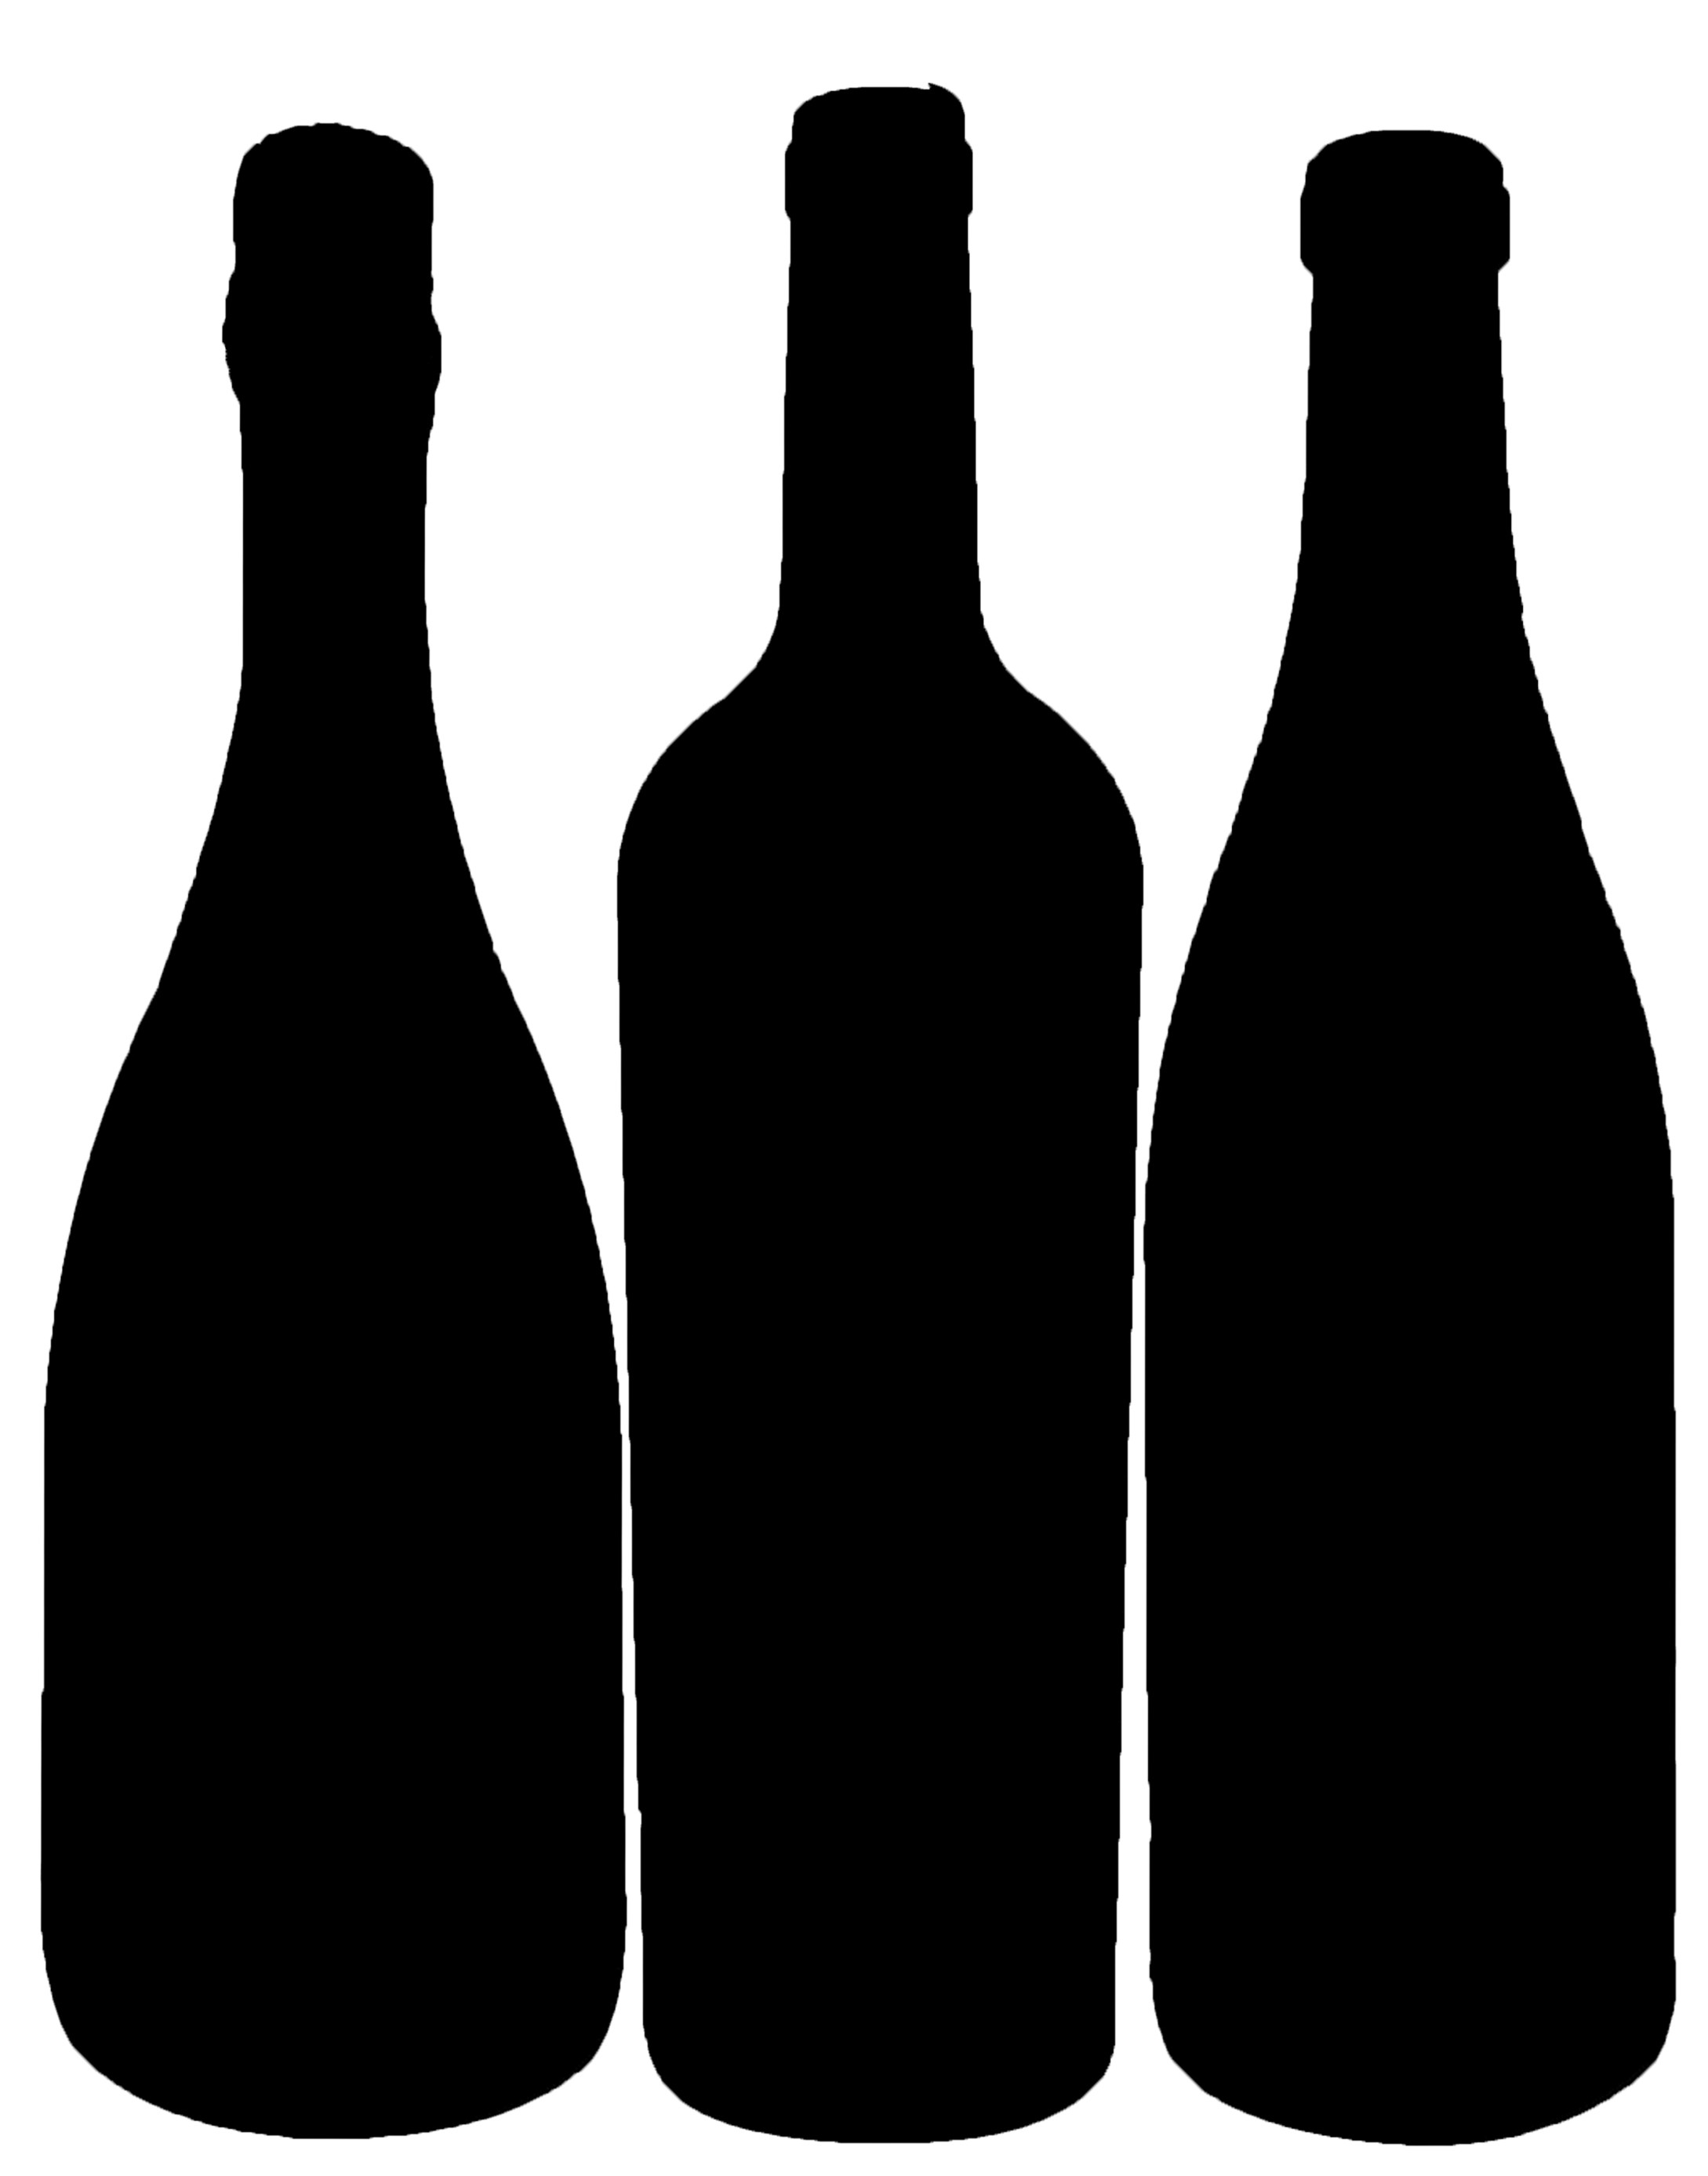 Wallpaper wine bottle silhouette clipart